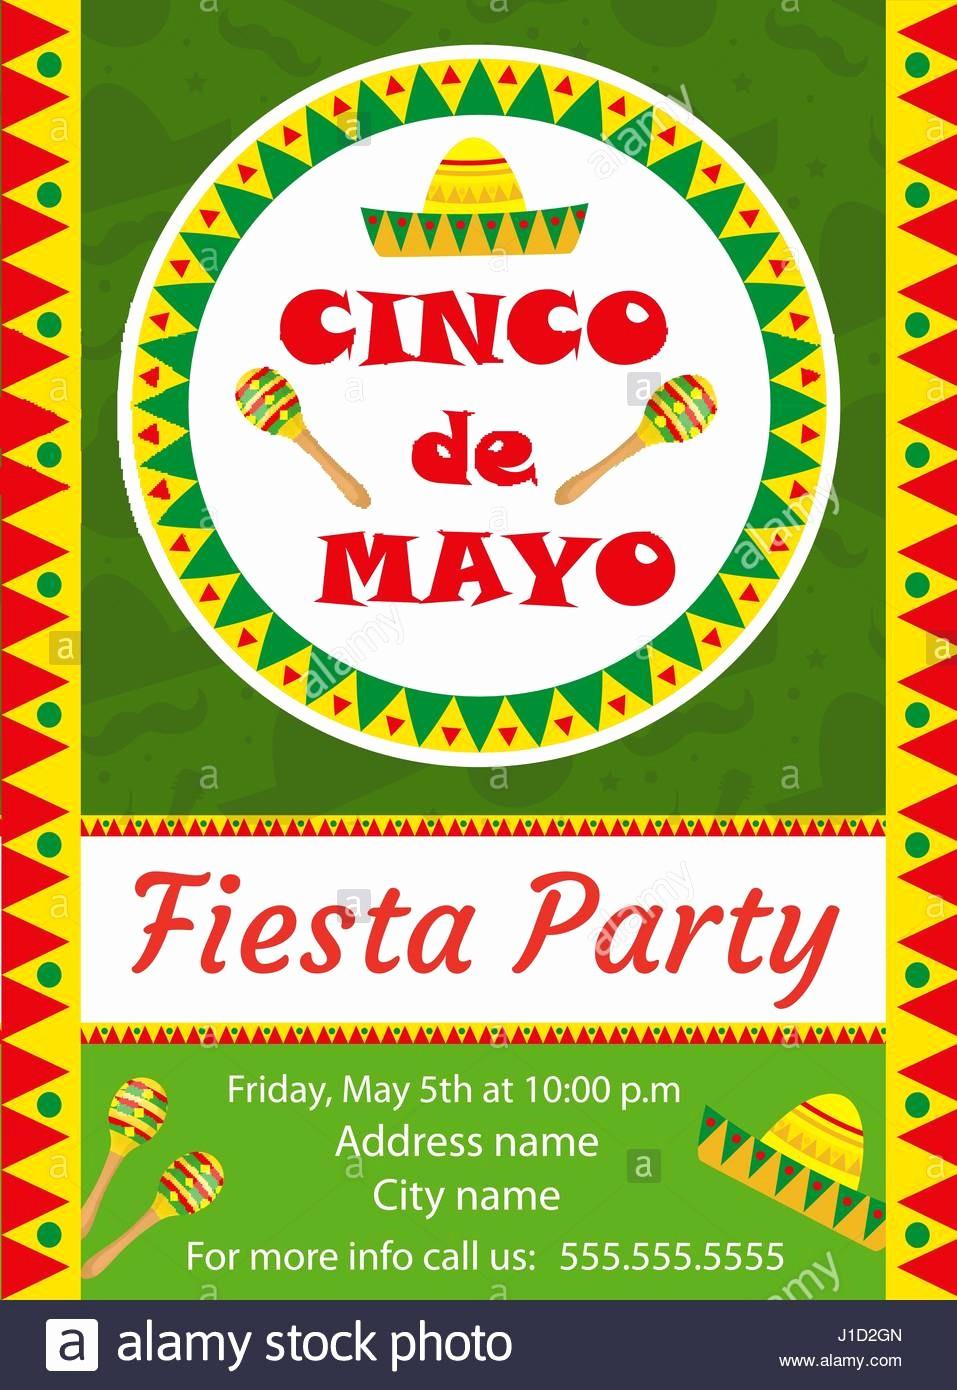 Cinco De Mayo Invite Template Best Of Cinco De Mayo Invitation Template Flyer Mexican Holiday